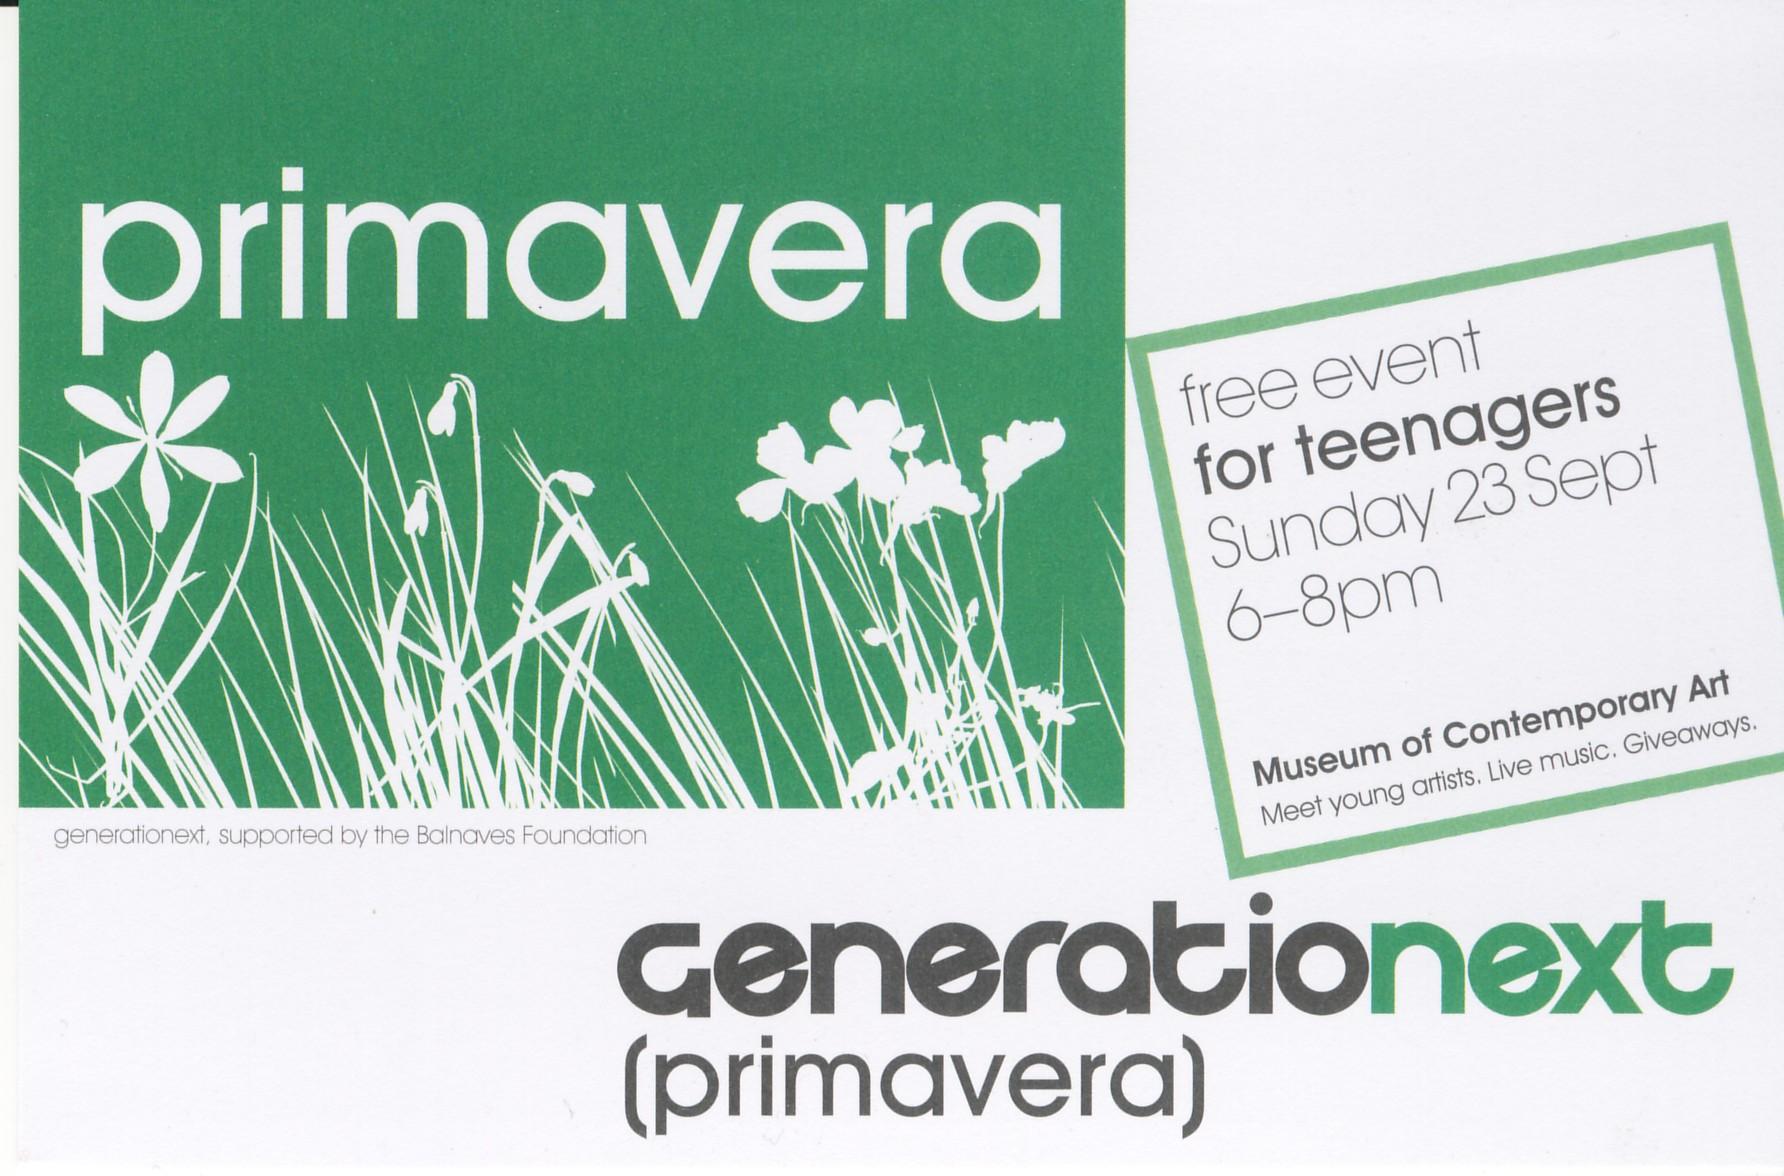 Generationext: 23 Sept 2007